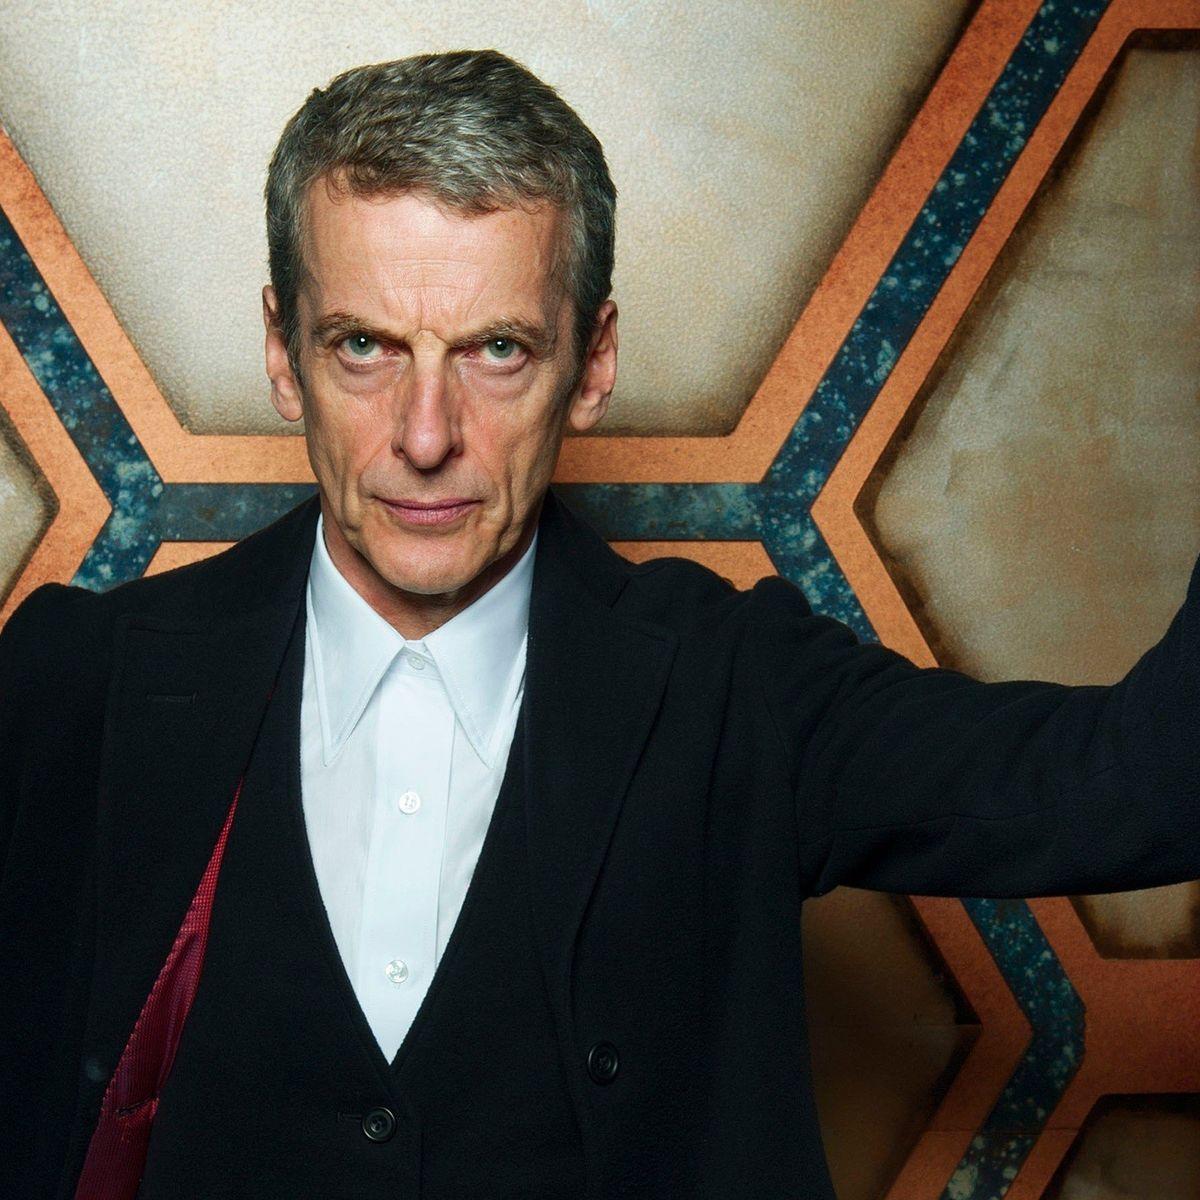 doctor-who-the-doctor-tardis-peter-capaldi.jpg